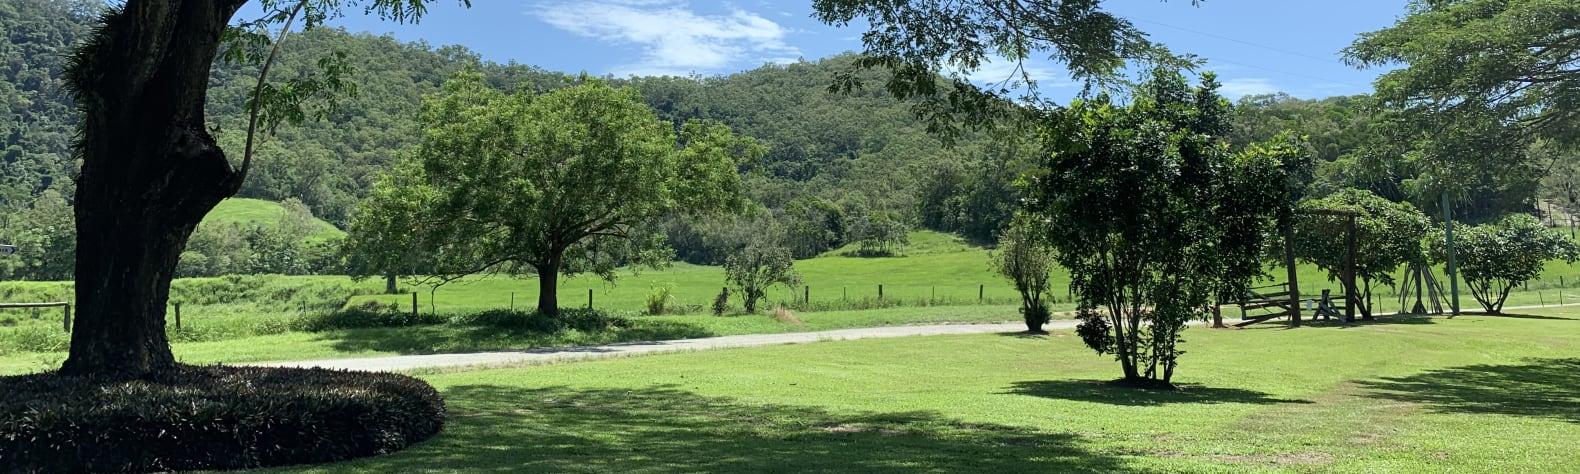 Mowbray Spring Creek Camp